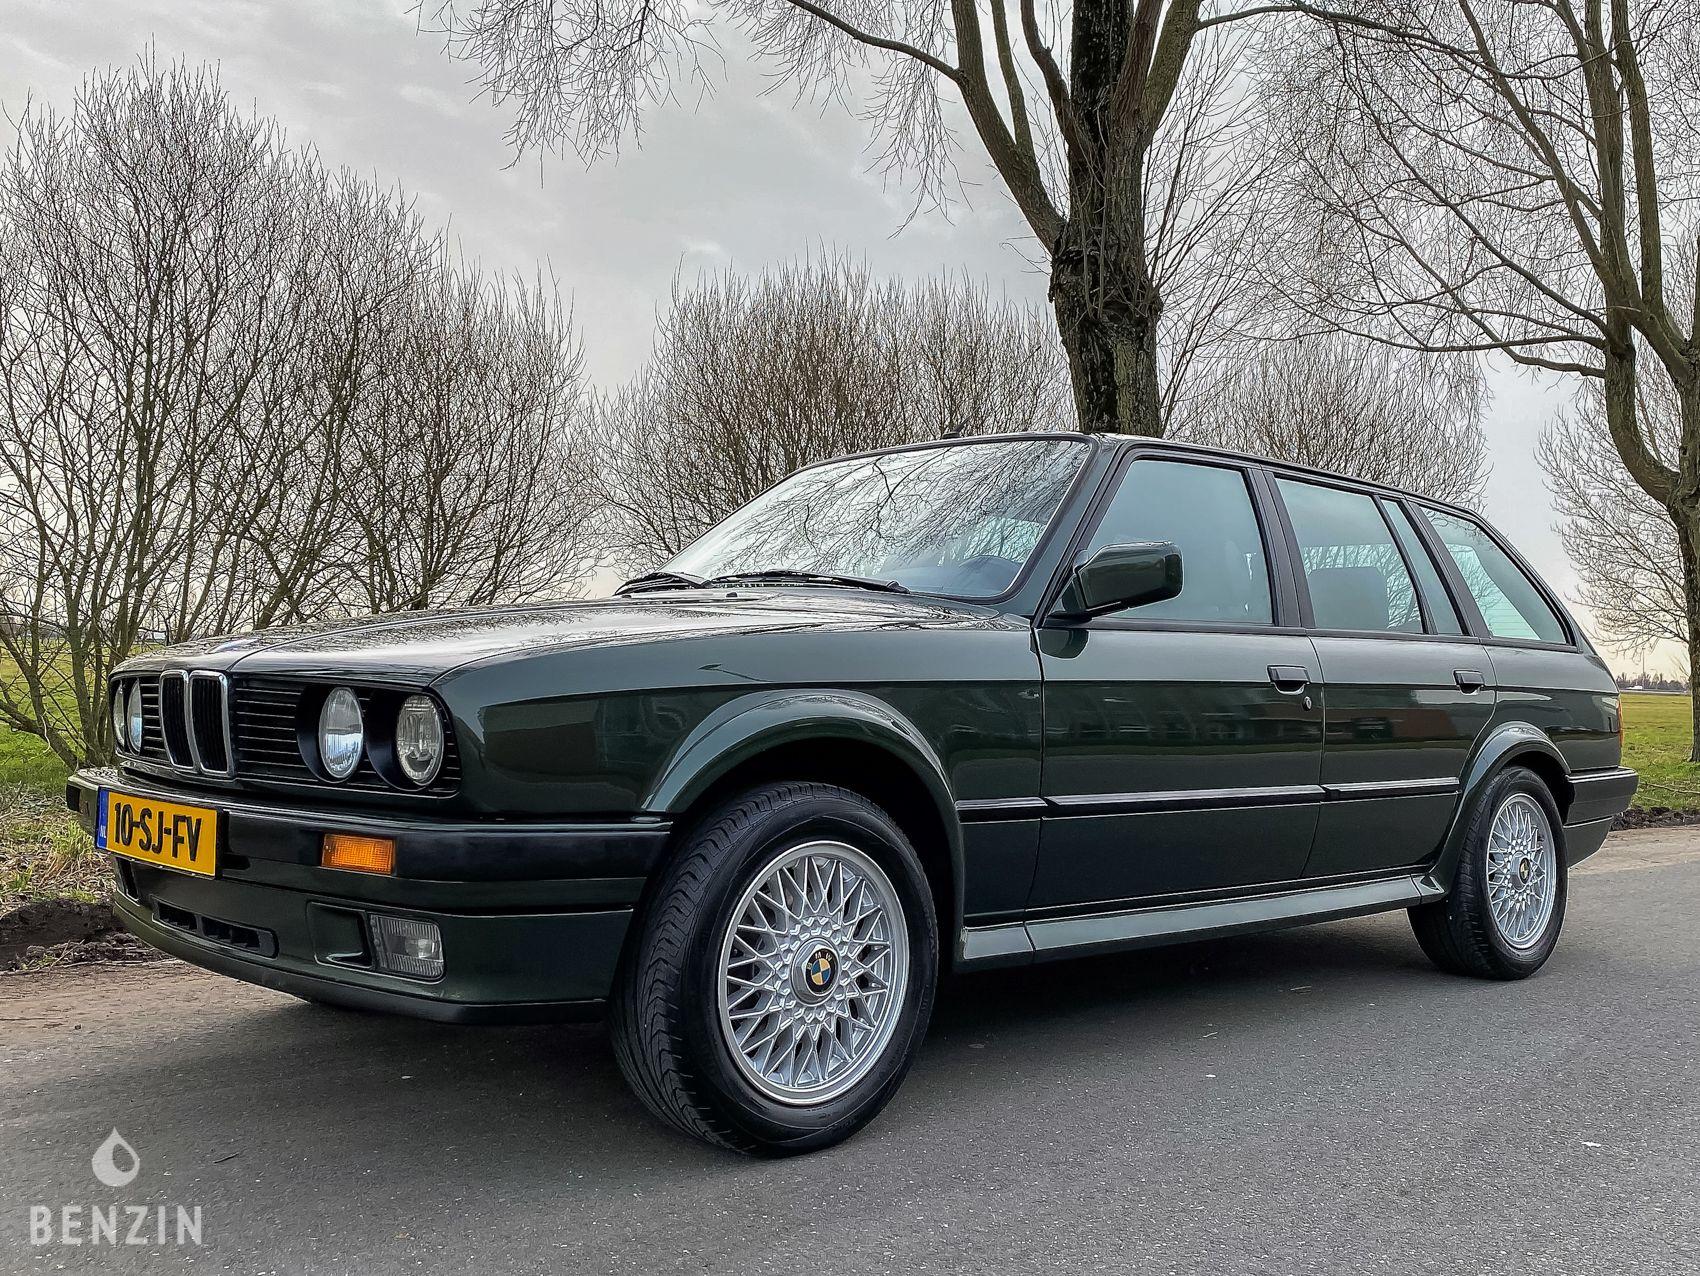 BMW 325 IX E30 TOURING OXFORD GREEN FOR SALE EN VENTE A VENDRE EN VENTA EN VENDITA TE KOOP SU VERKAUFEN